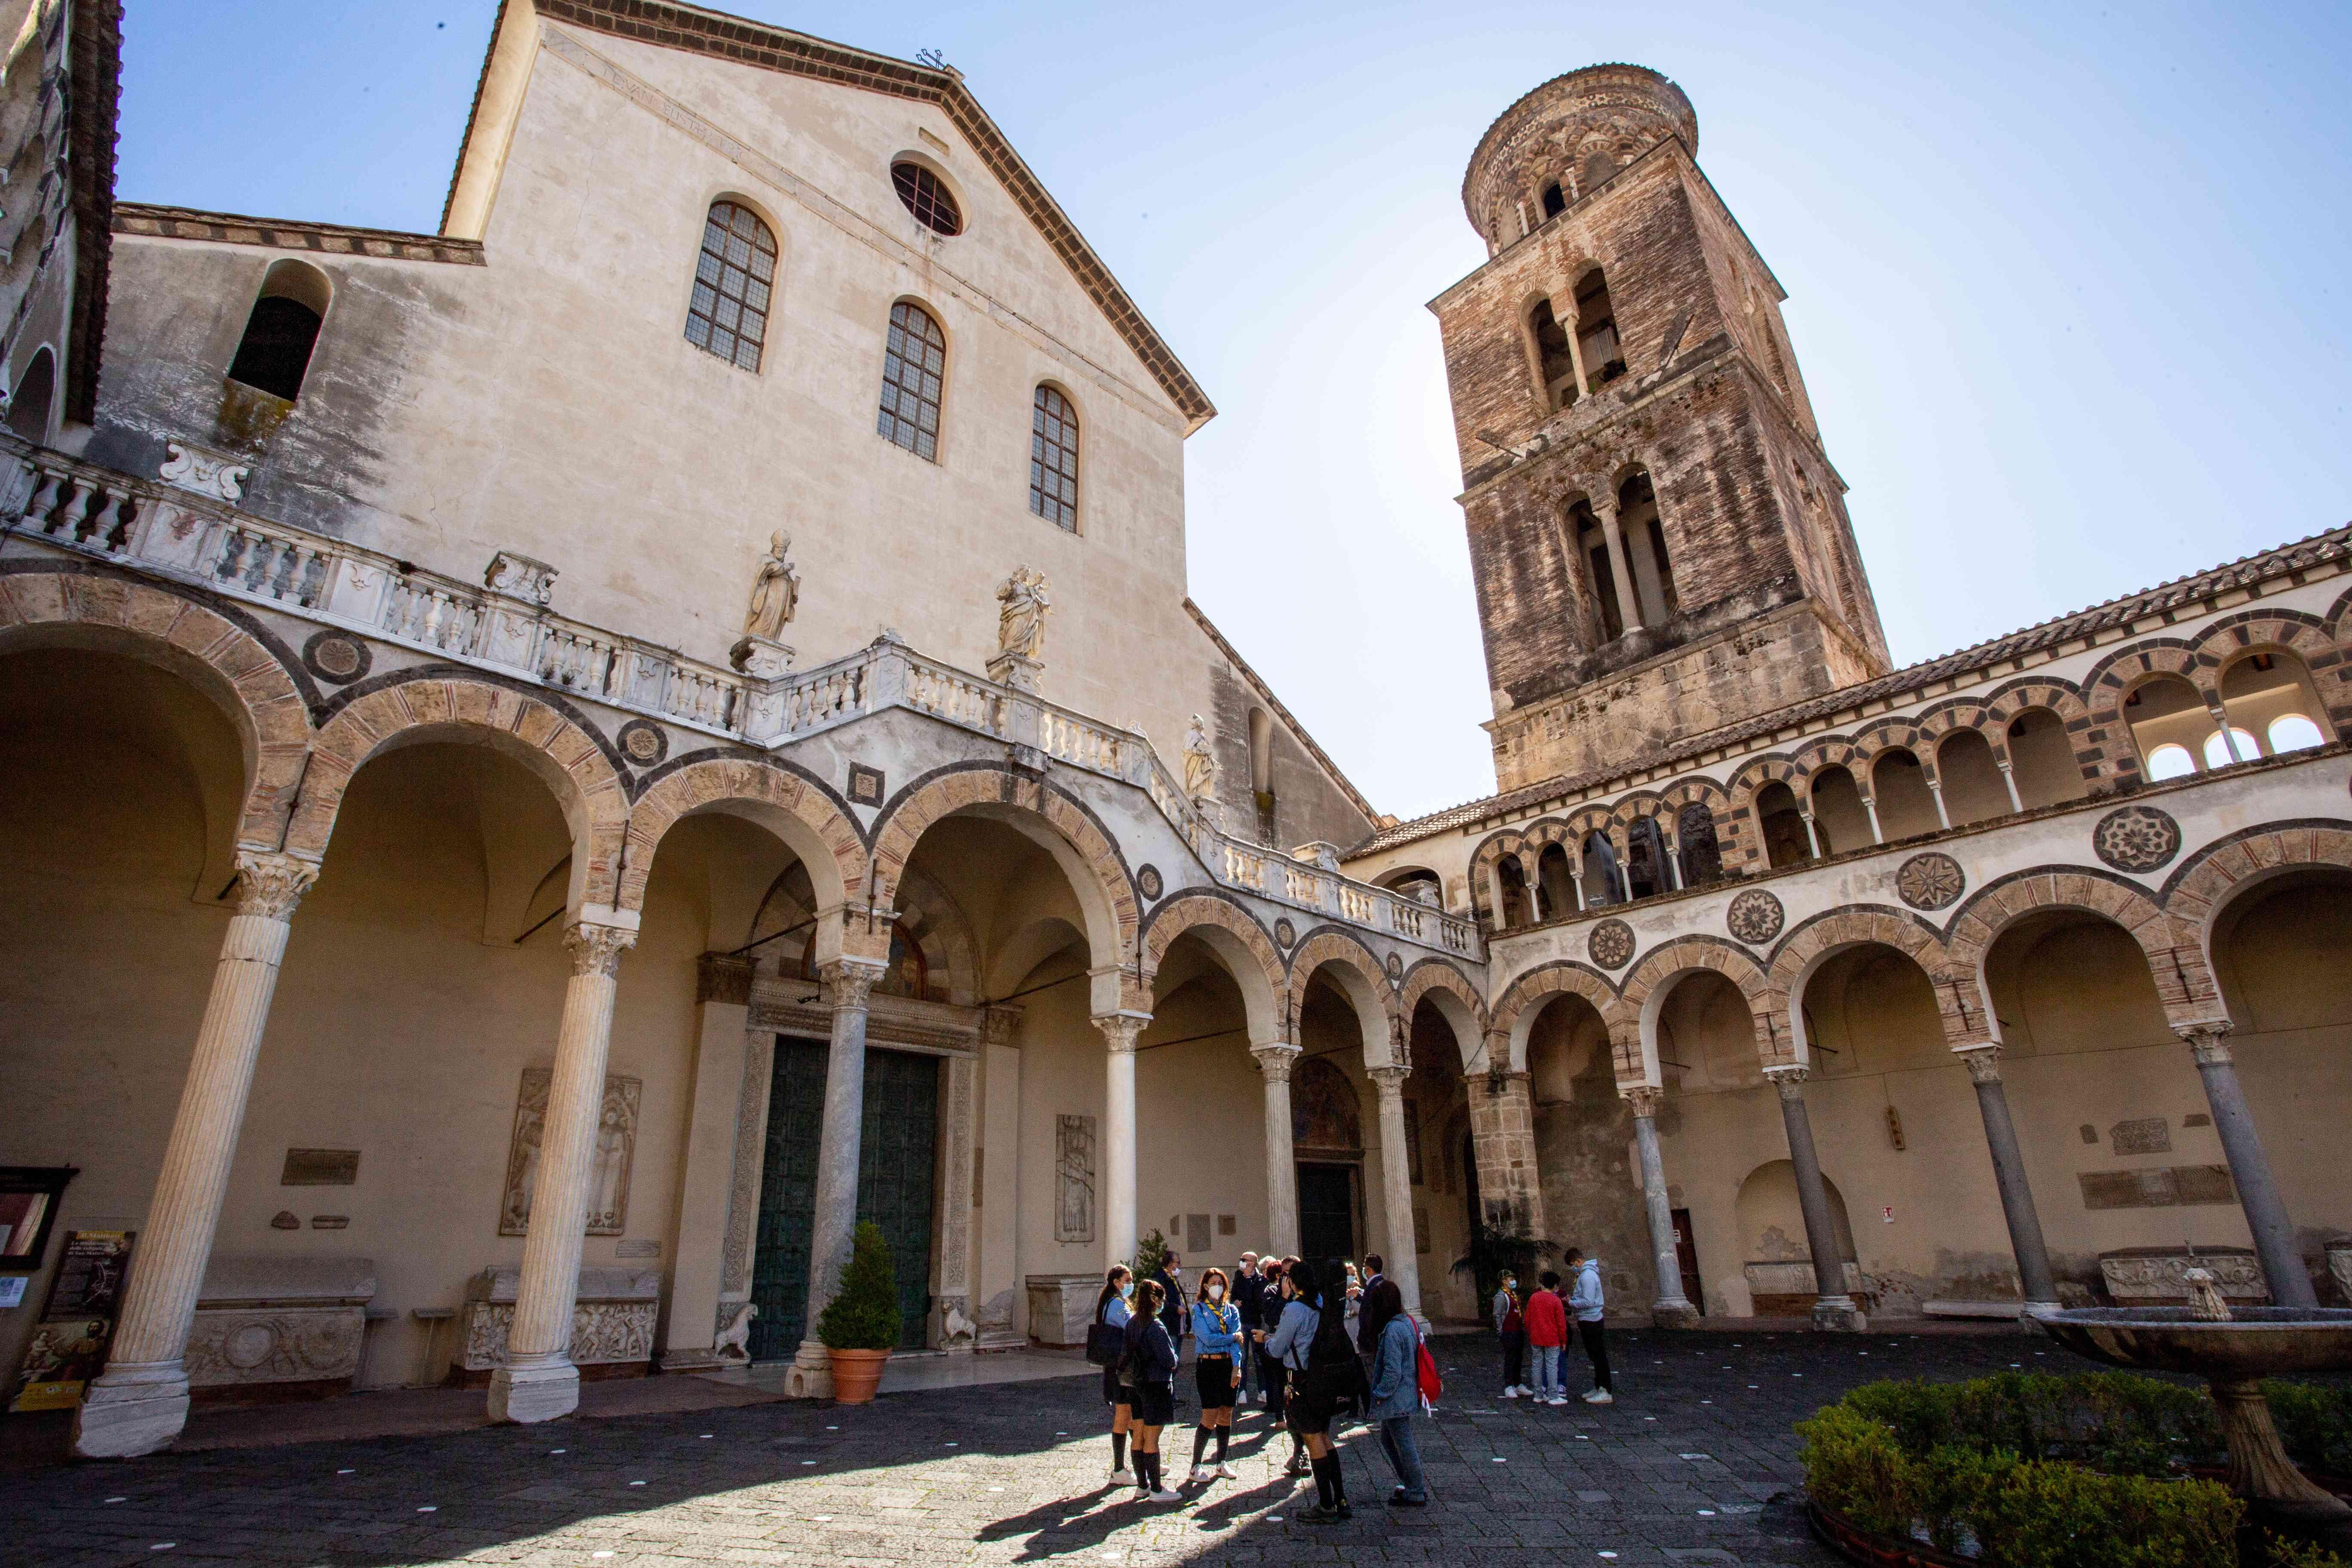 Exterior of the Duomo di Salerno